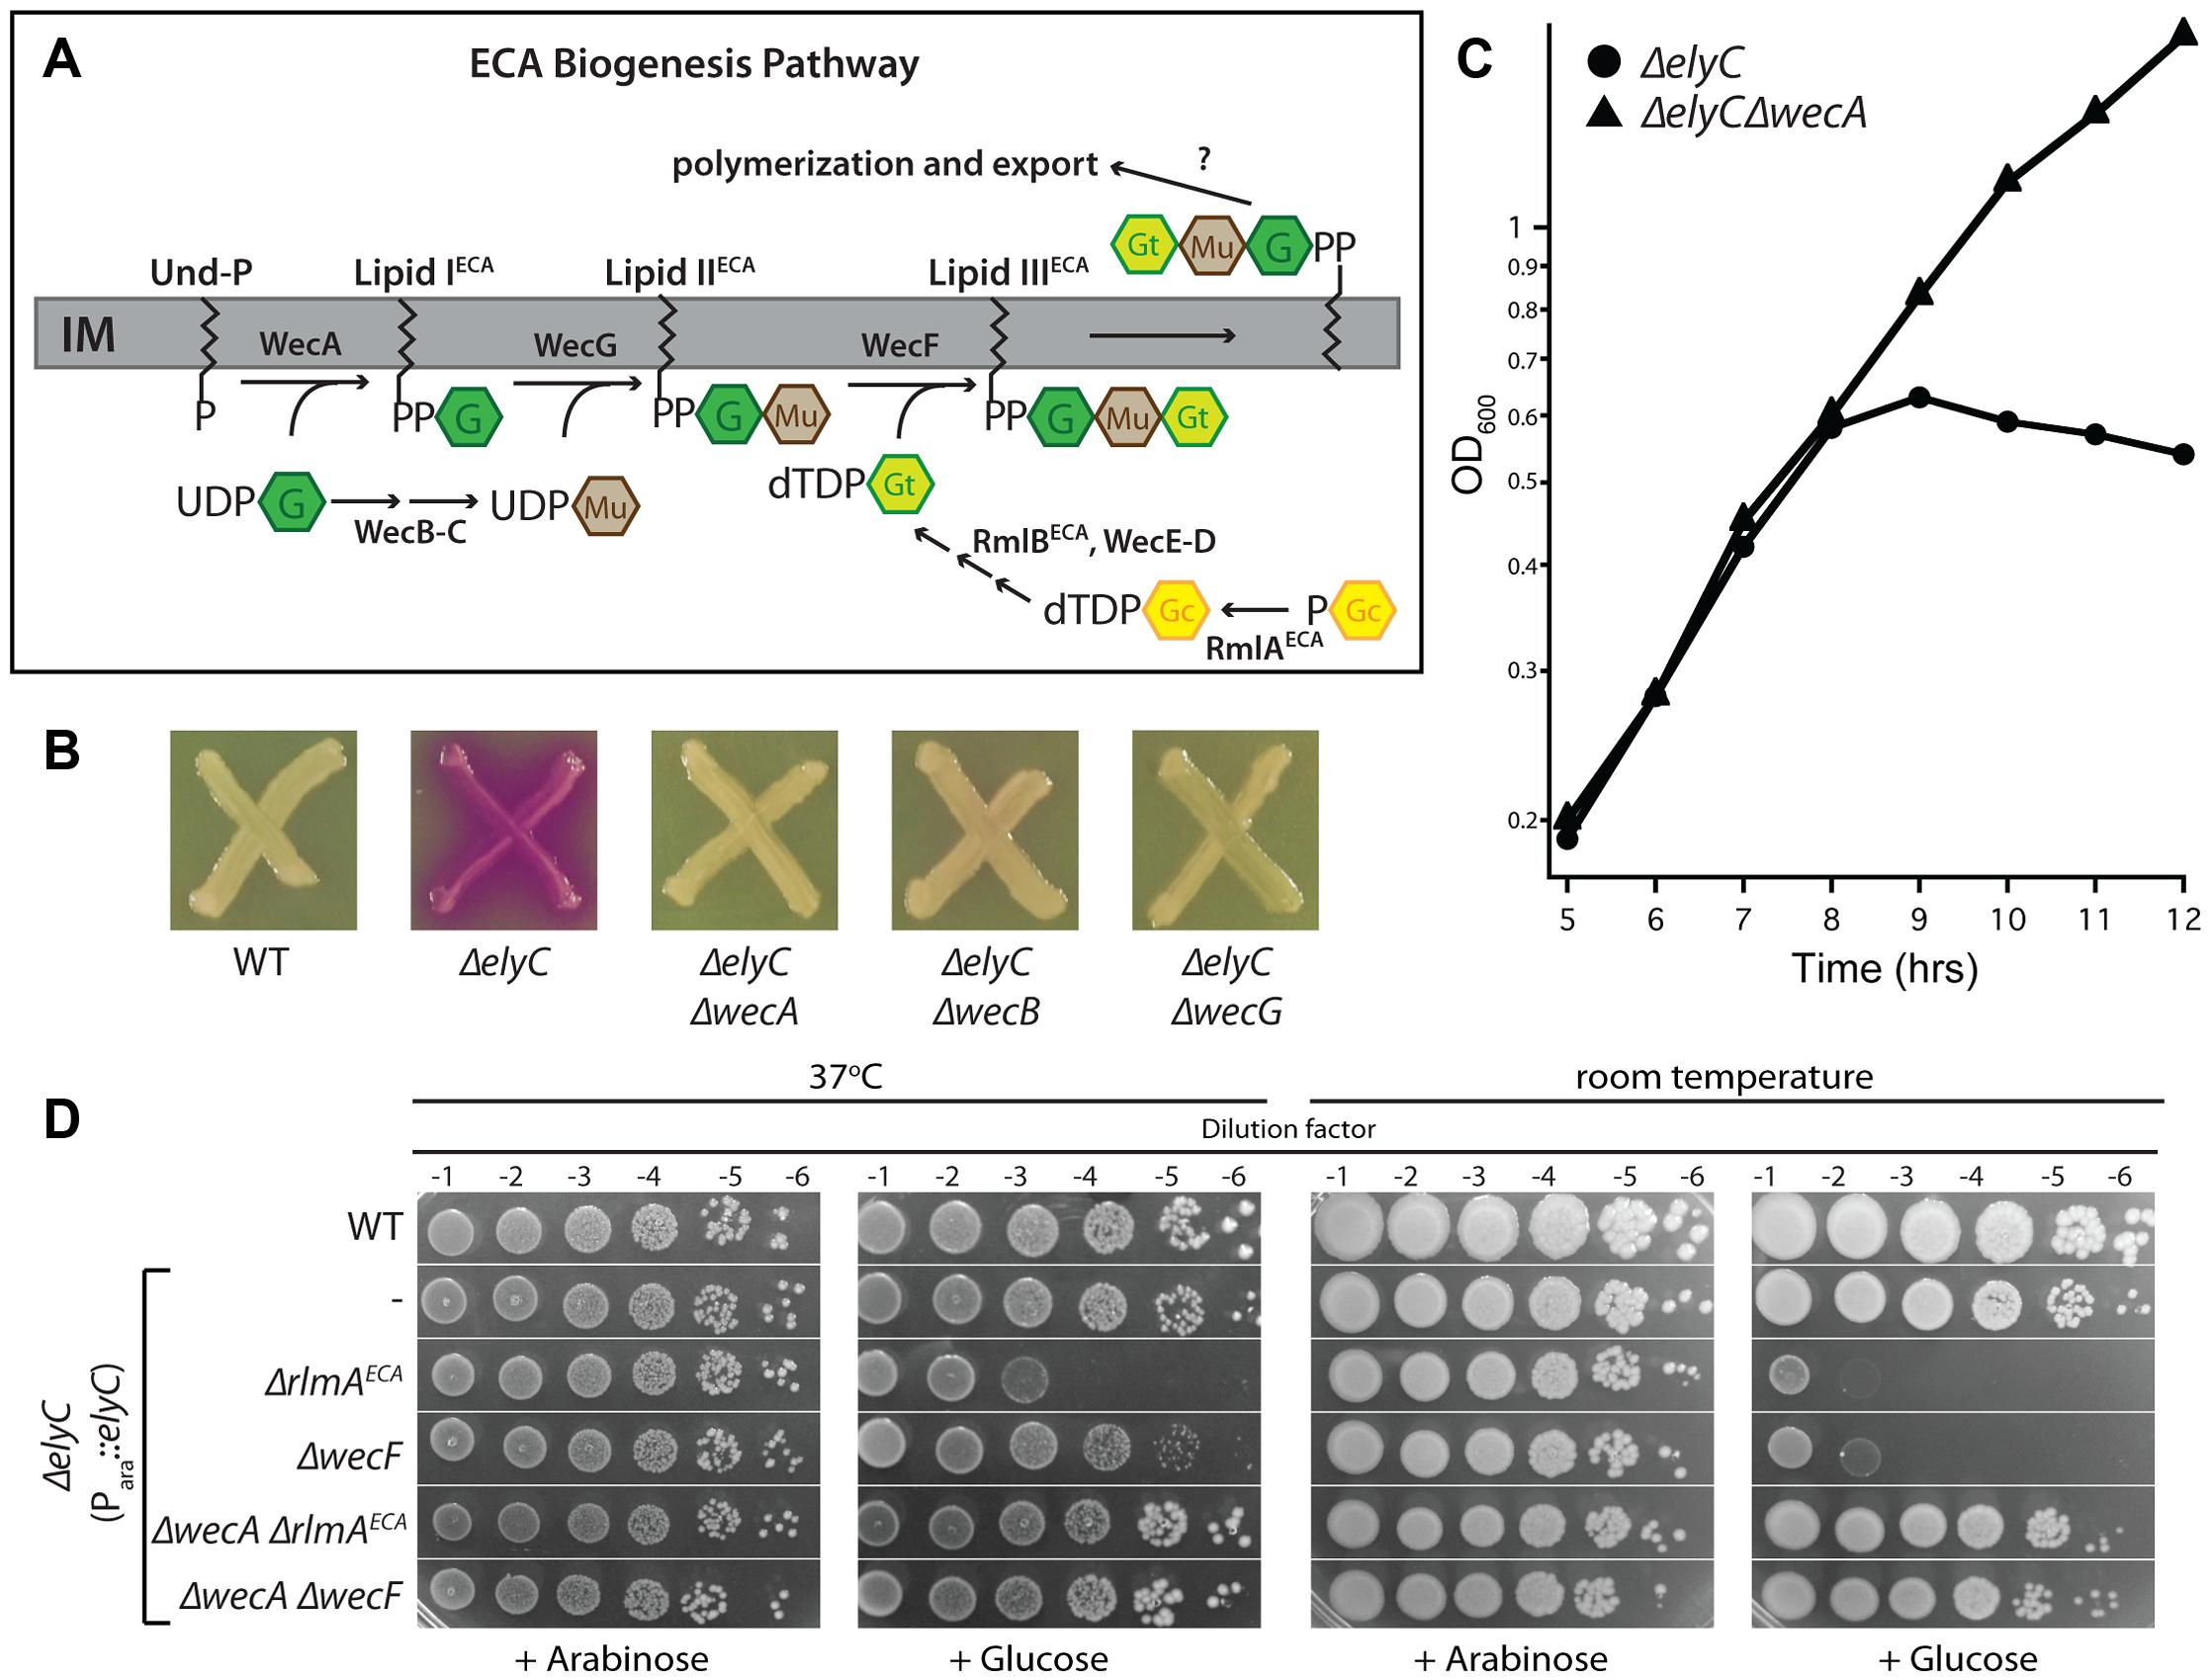 Genetic interaction between ElyC and the ECA biogenesis pathway.